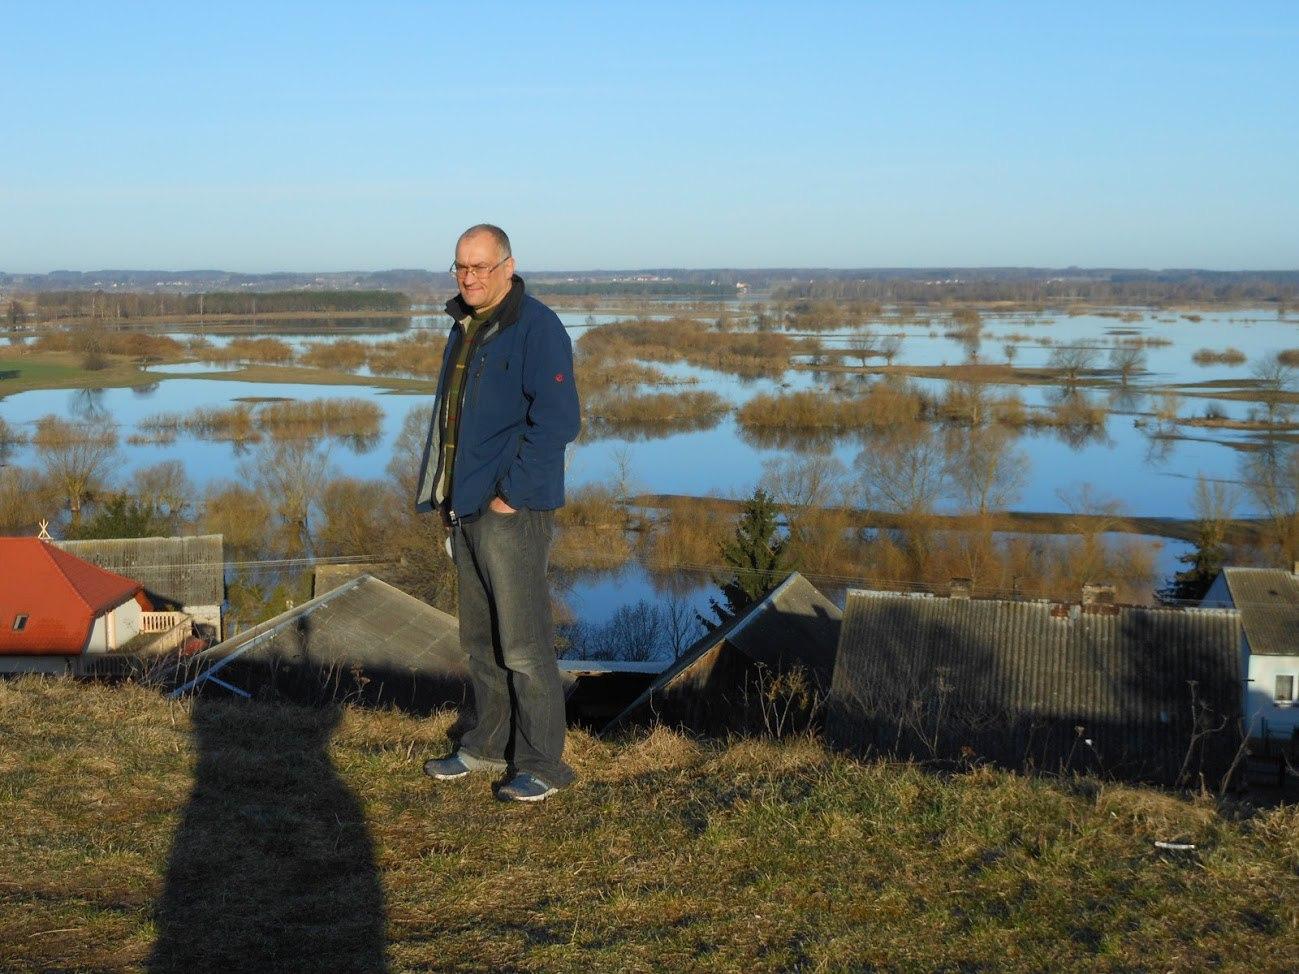 Maciej Jaroszewski в Польше